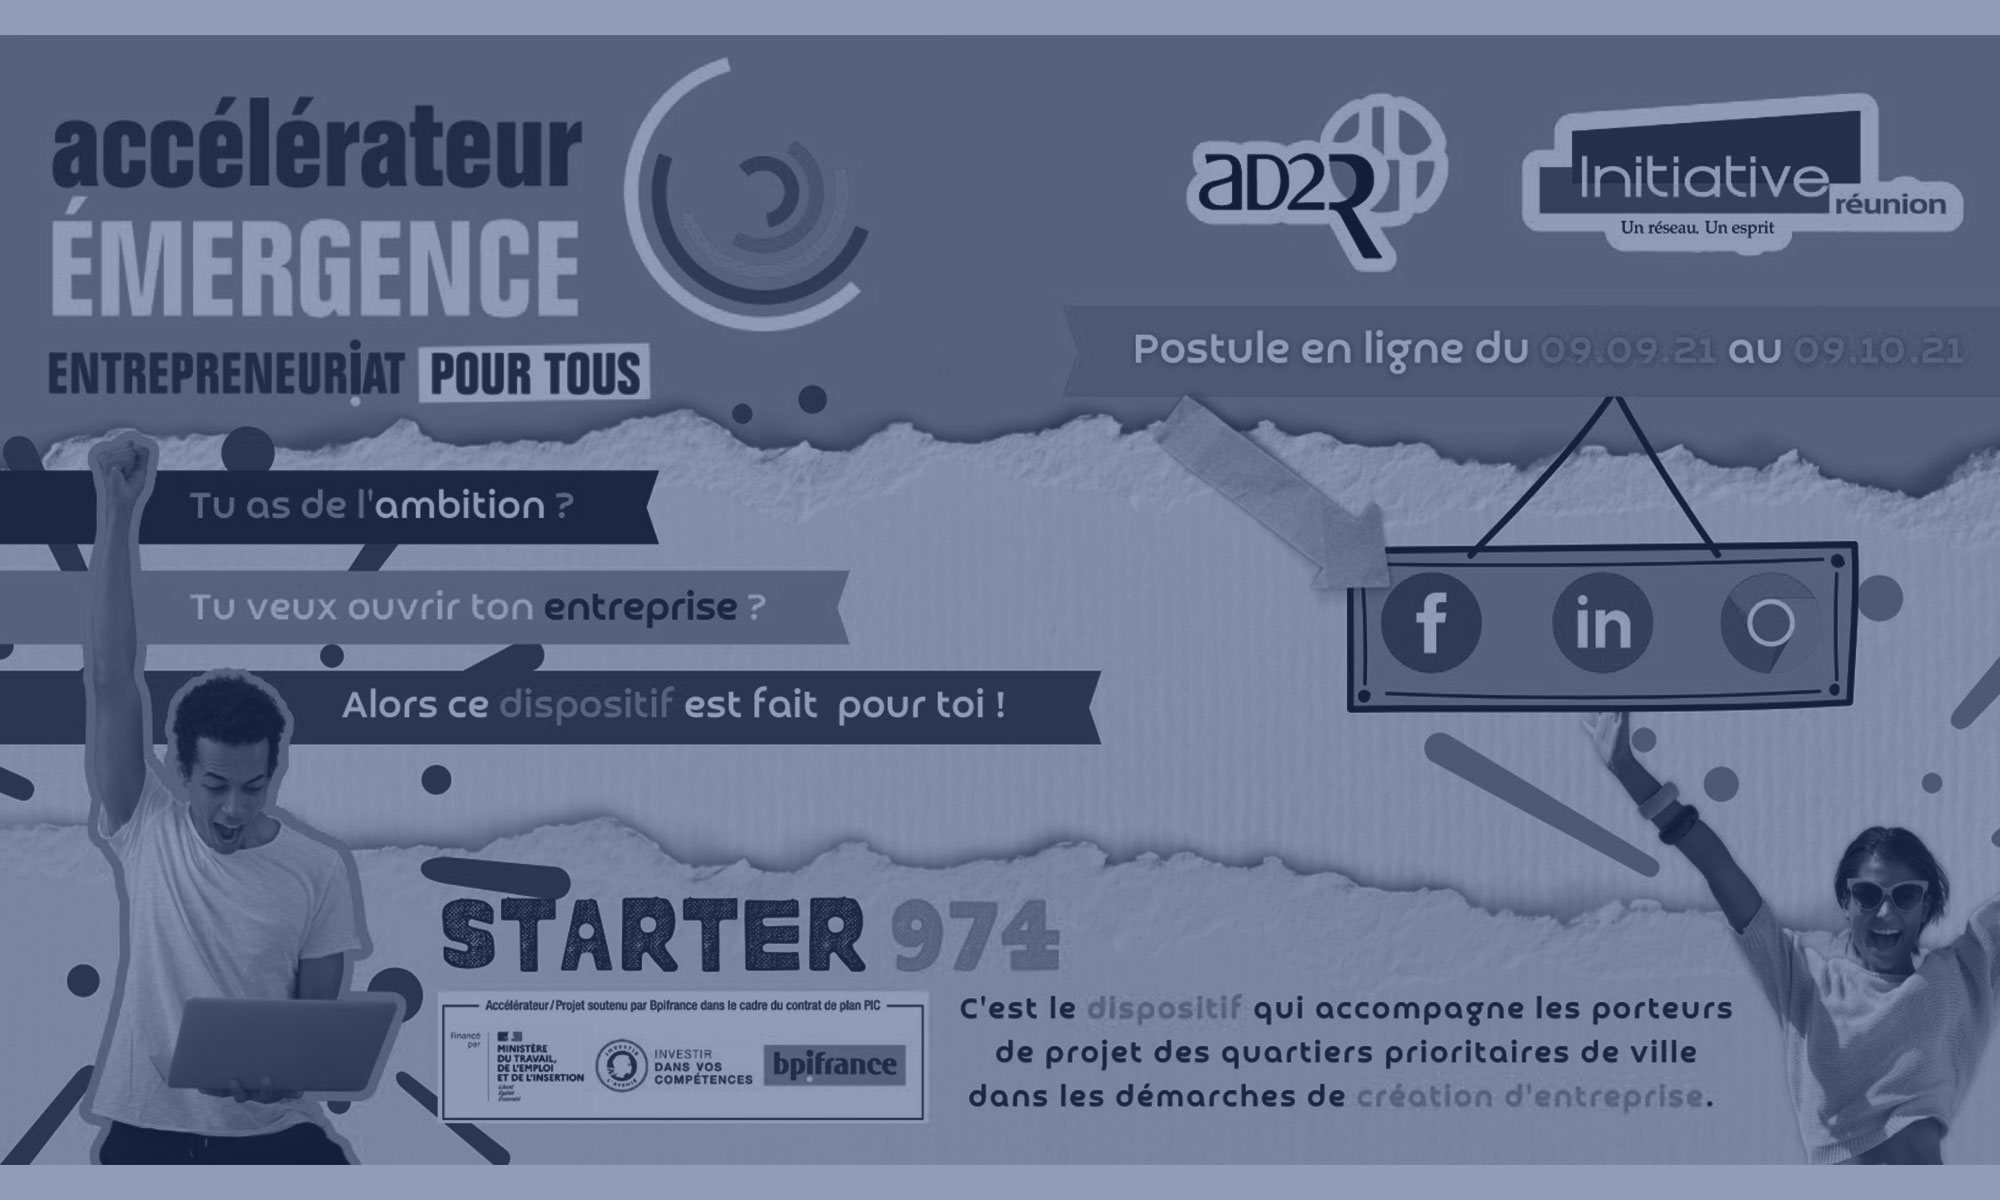 ansamb-elles-article-starter974-initiativereunion